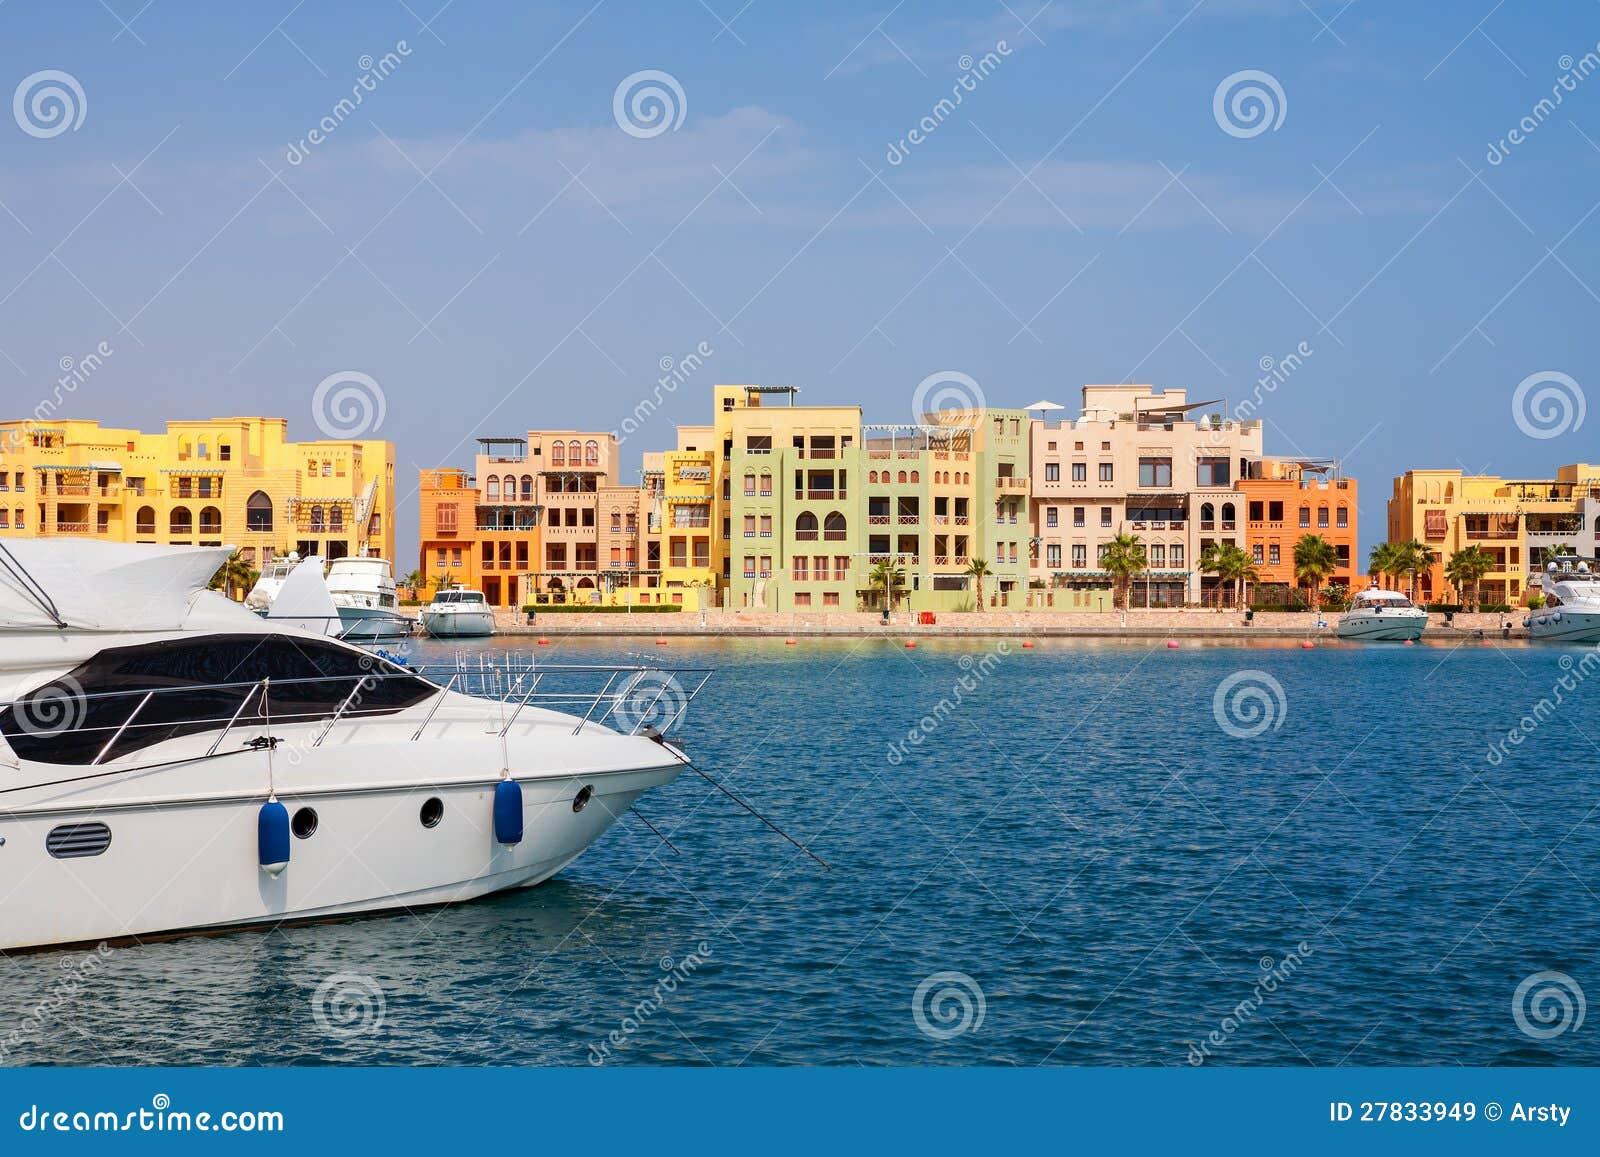 Marina el gouna egypt royalty free stock images image for Blue sea motor inn